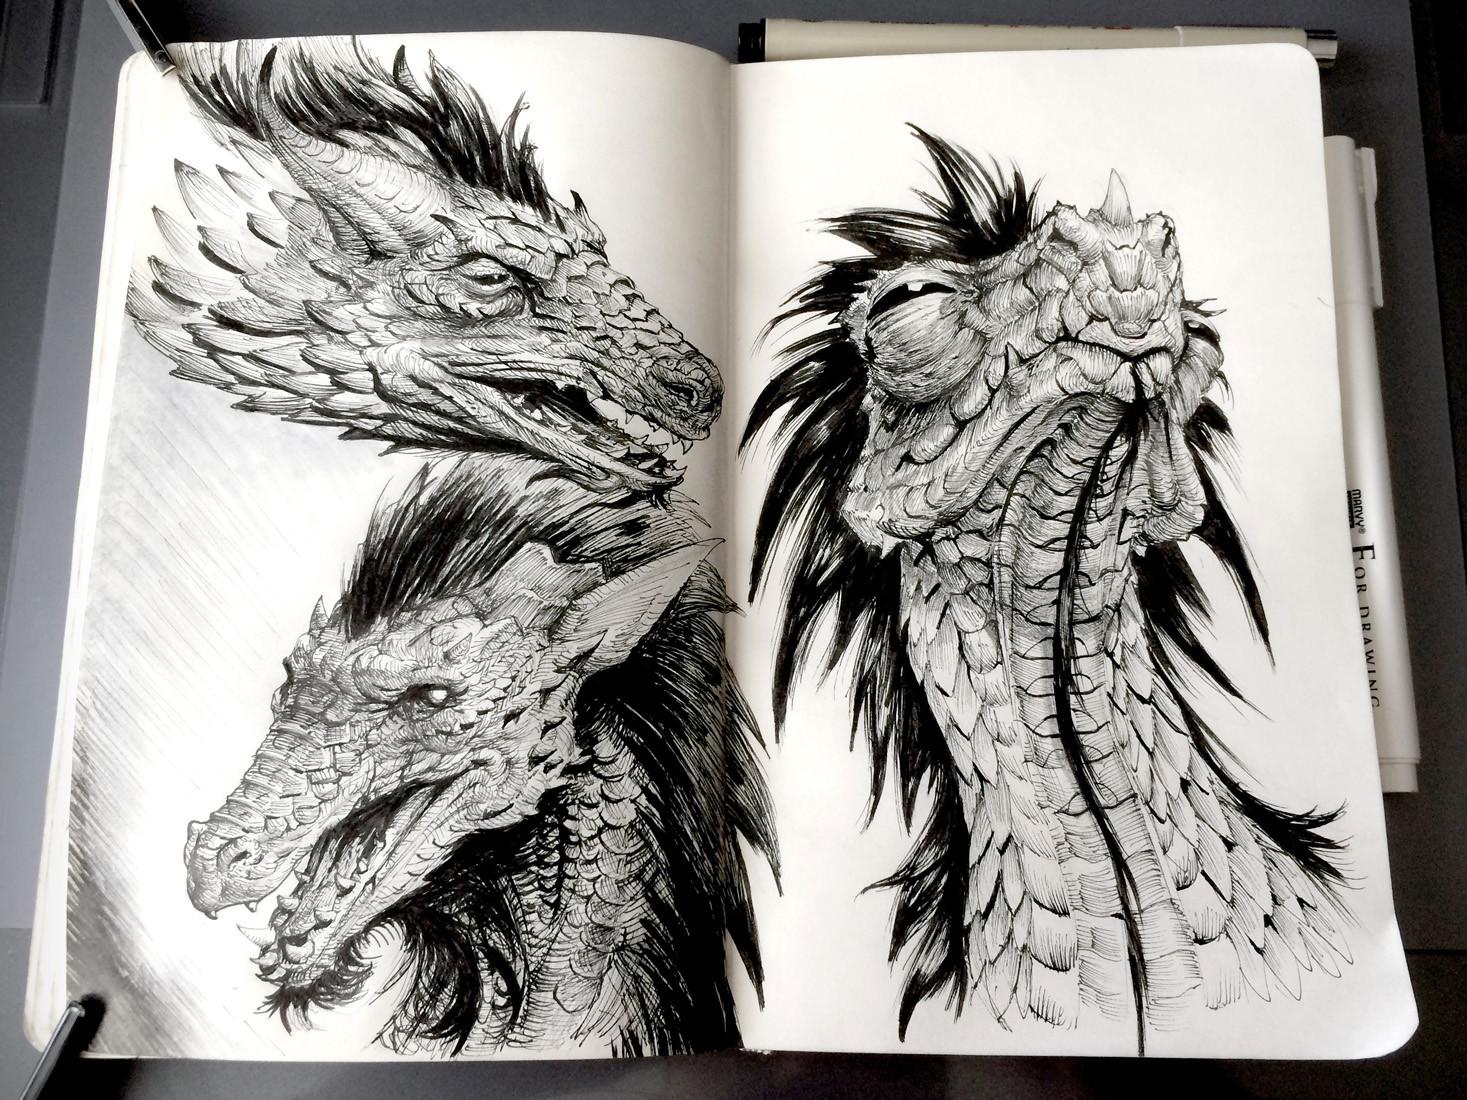 Miro petrov image8 dragons